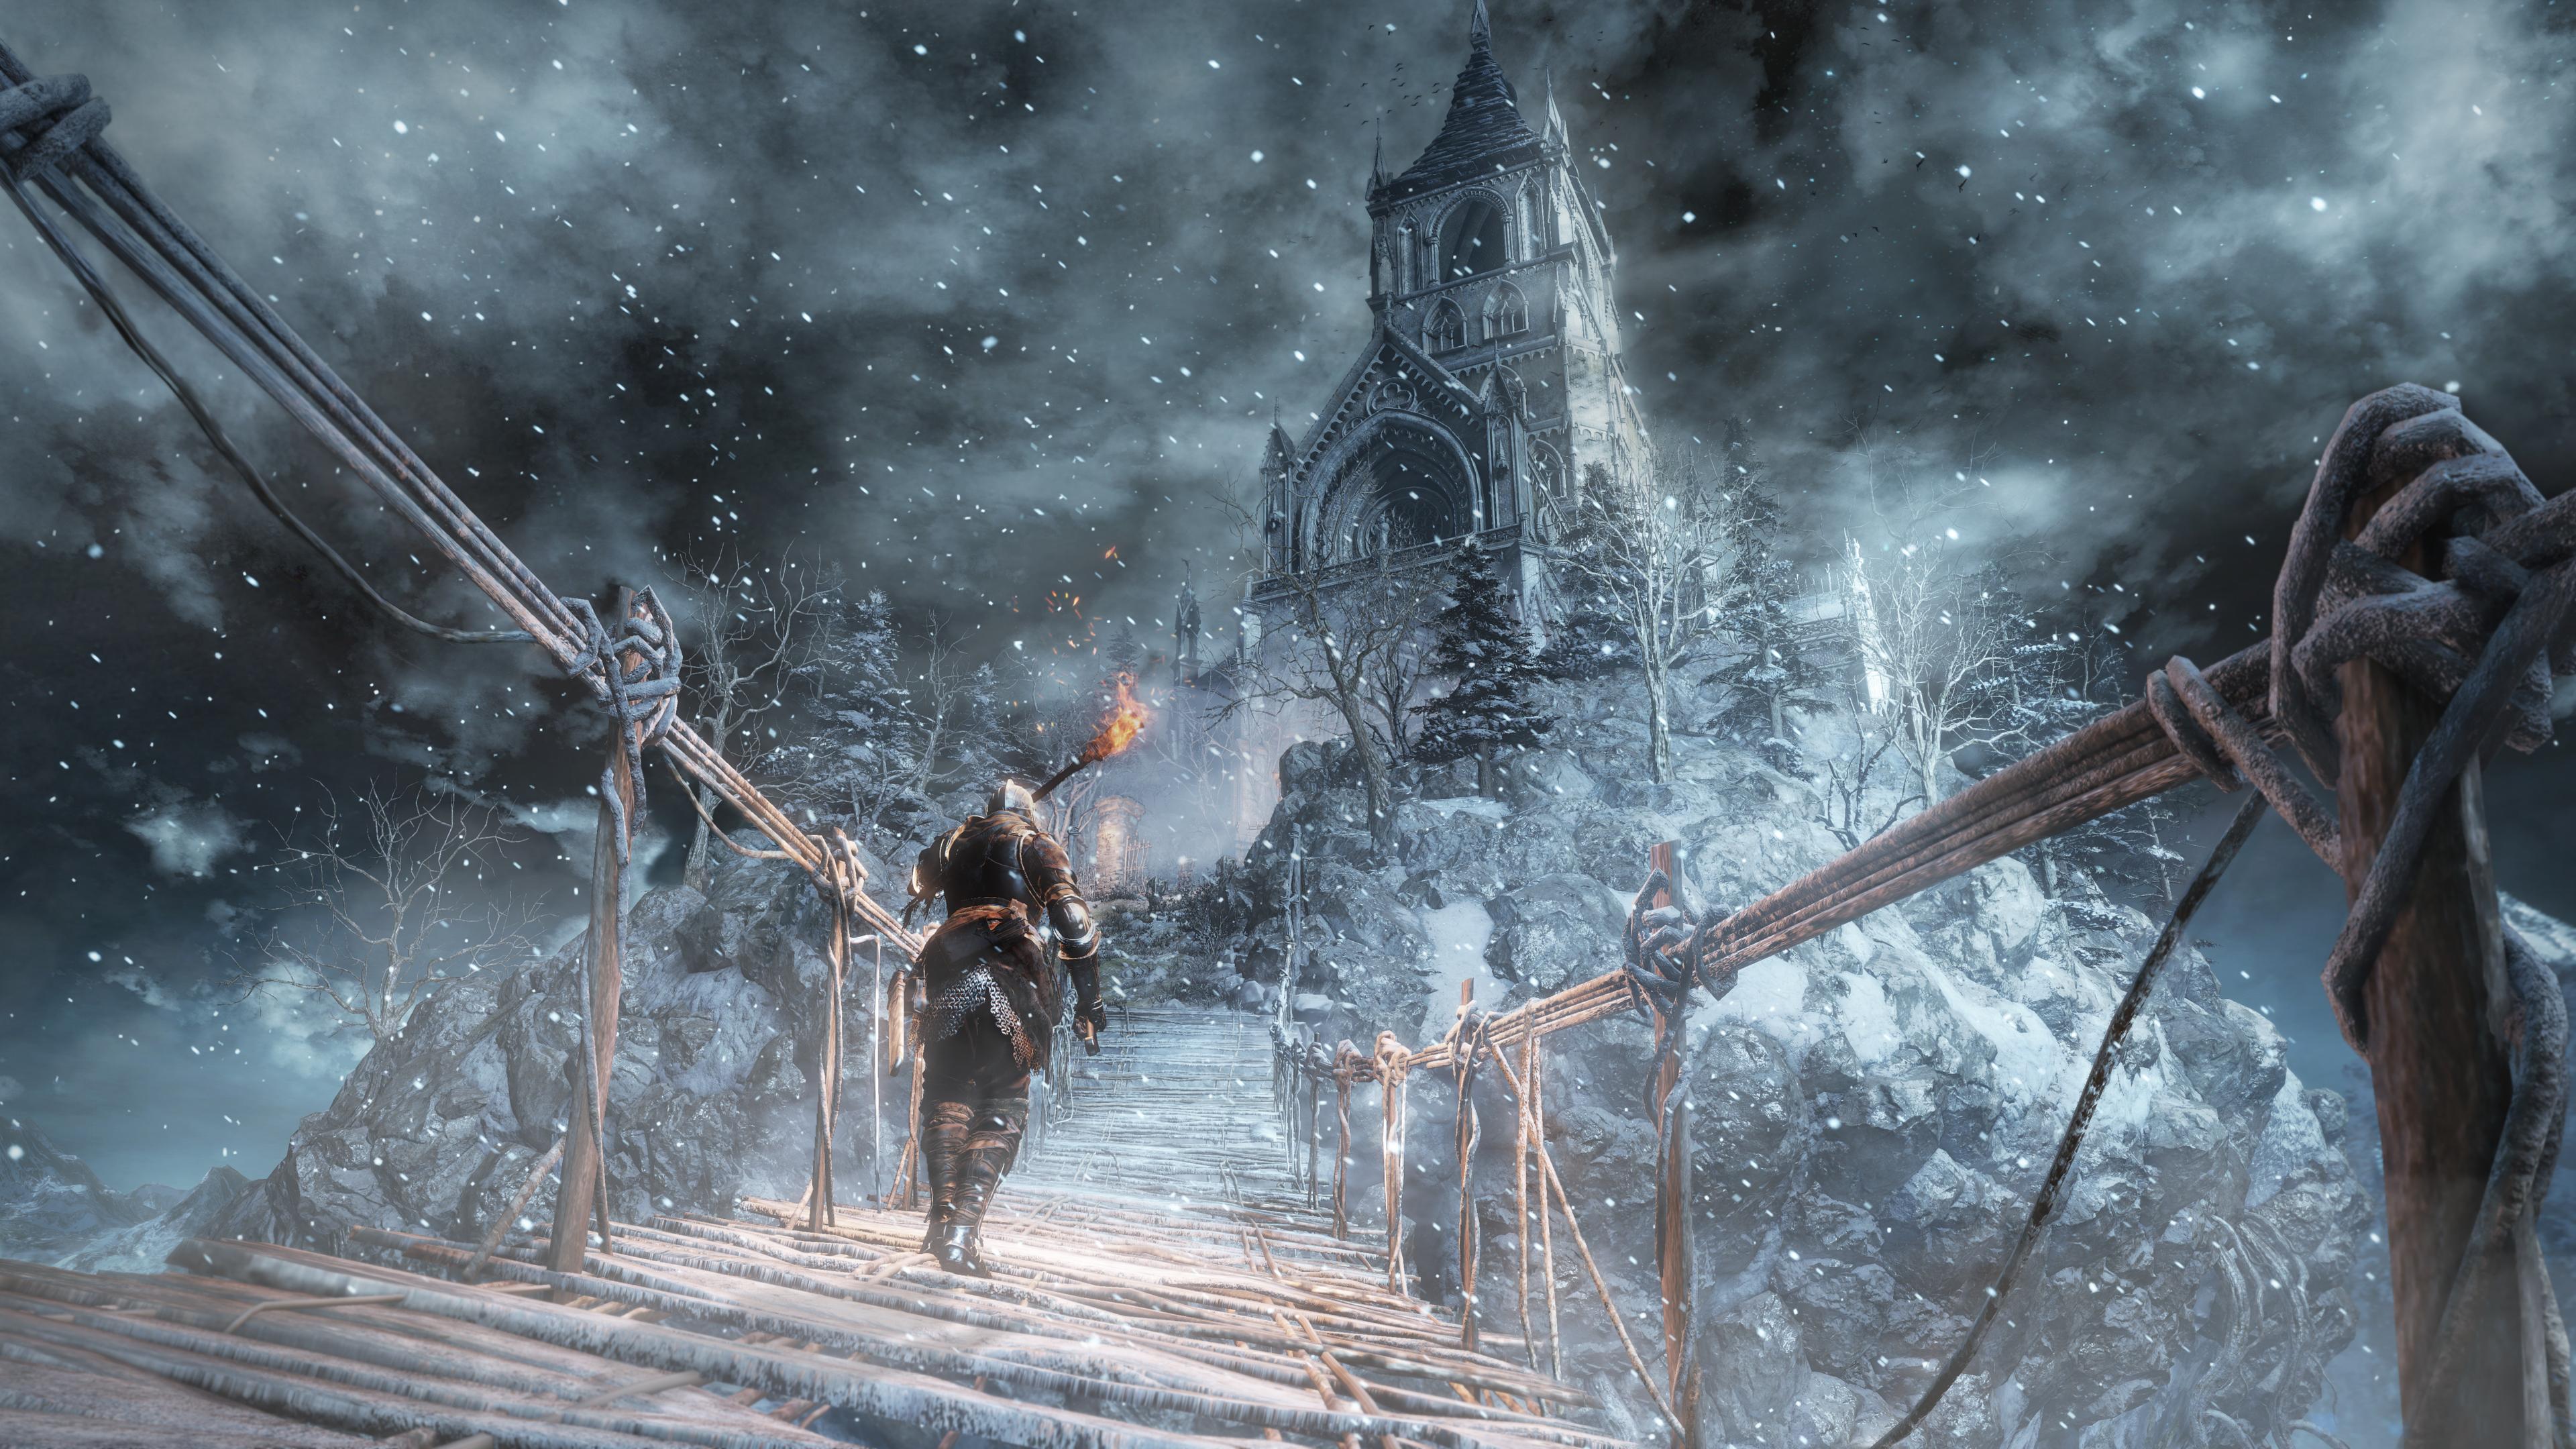 Dark Souls 3 Speedrunner Beats World Record In Under 70